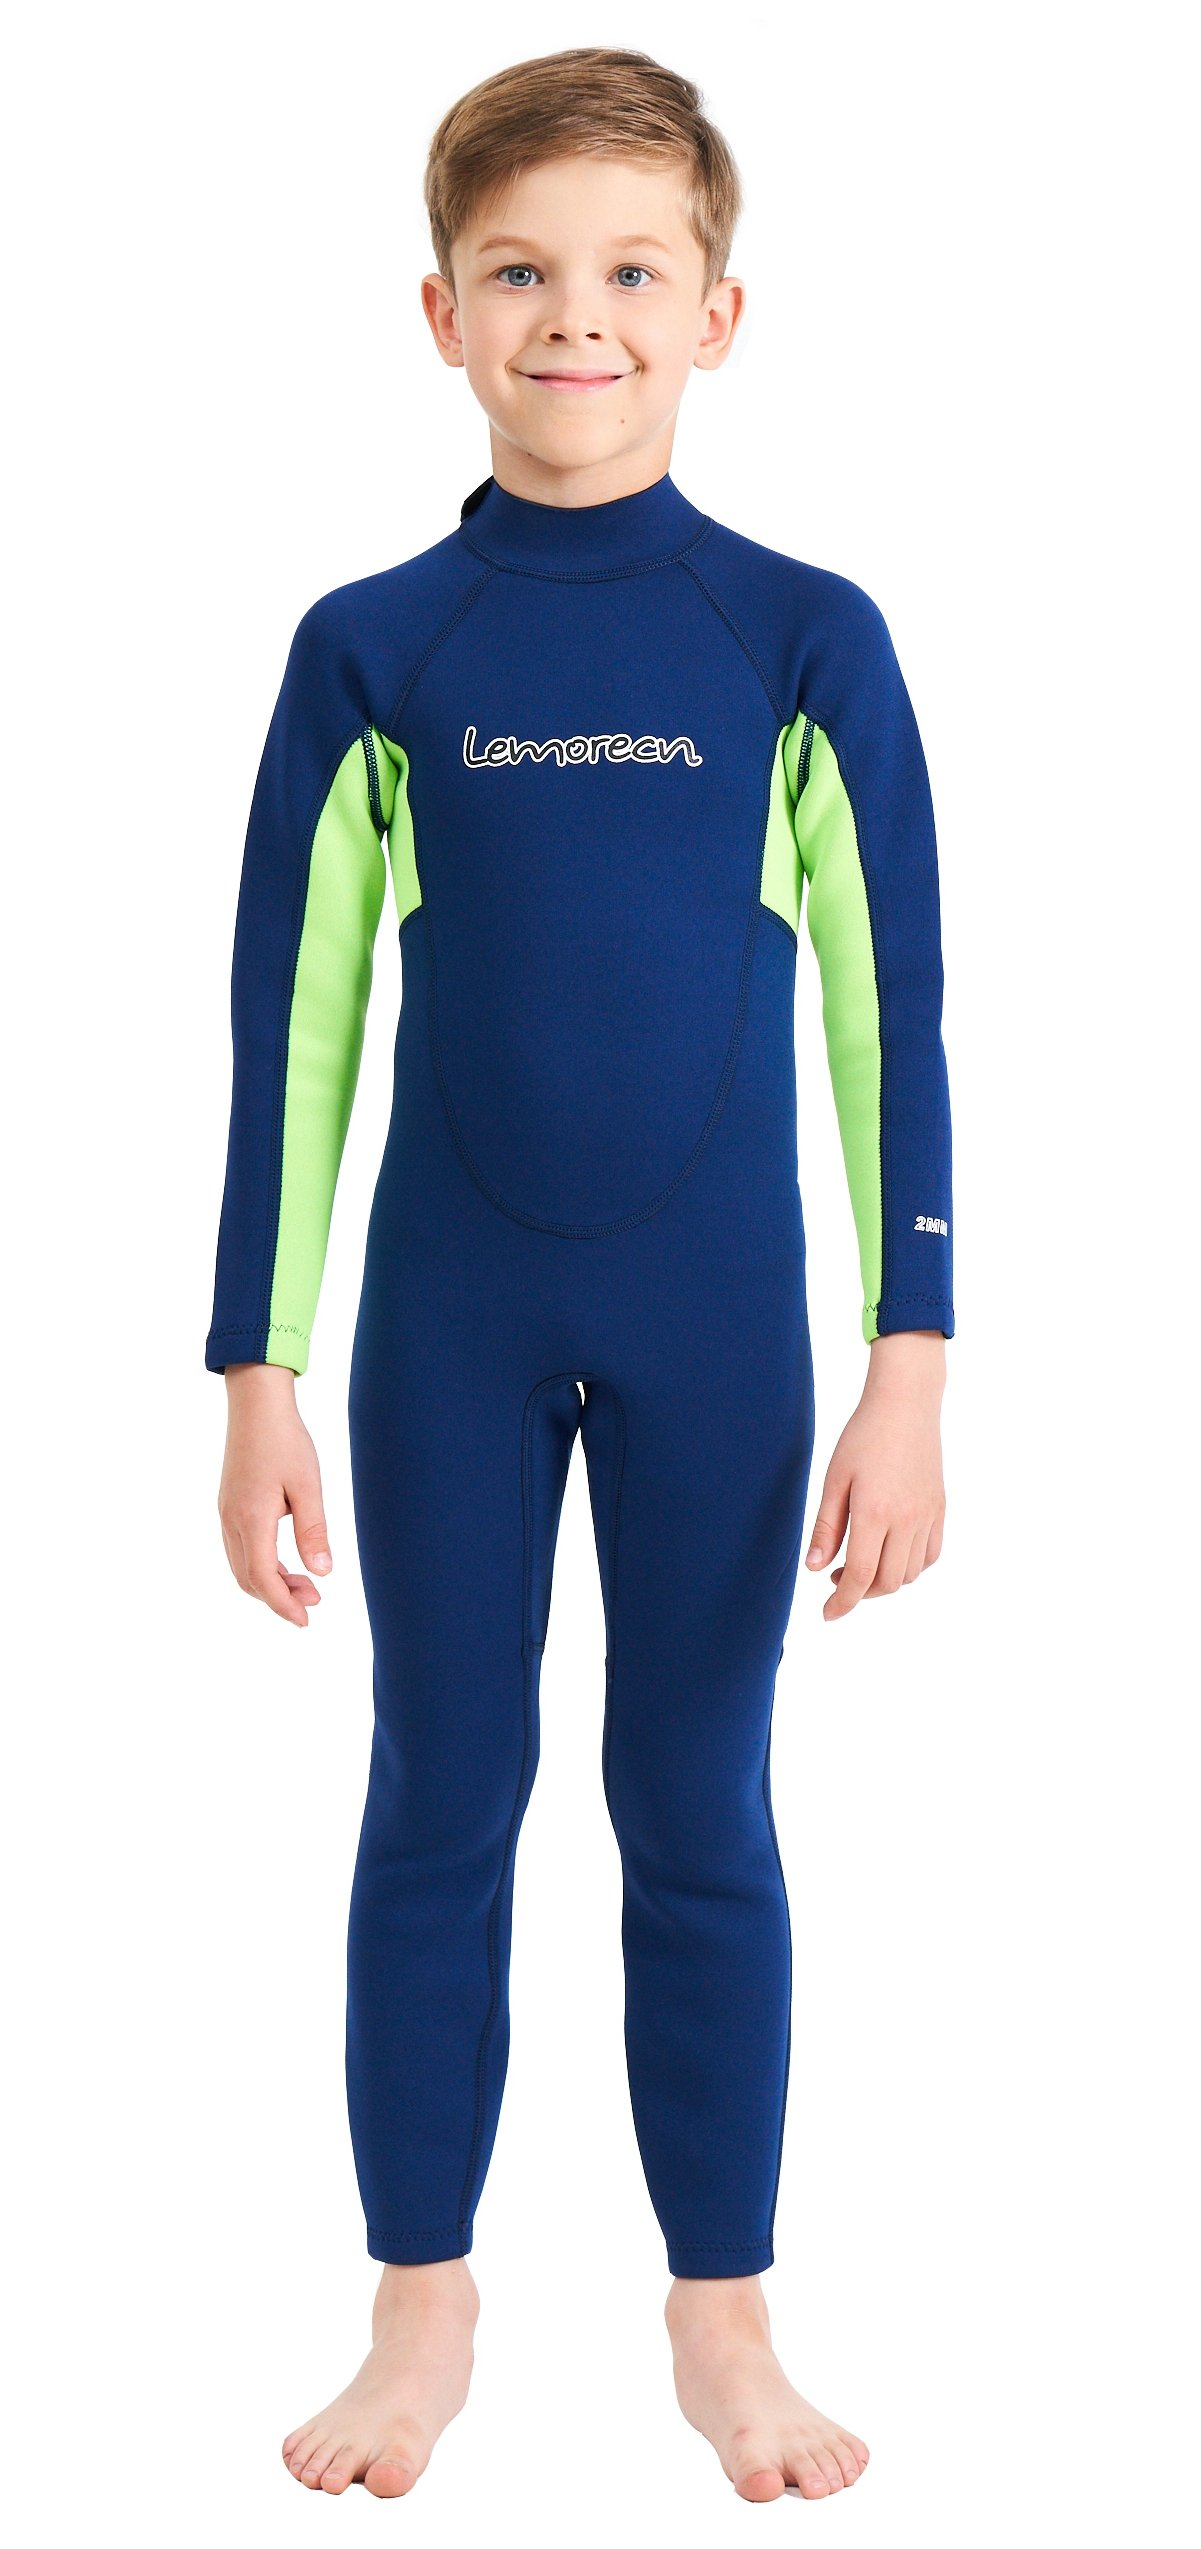 Lemorecn Wetsuits Youth 2 mm Full Diving Suit(4032navygreen-4)